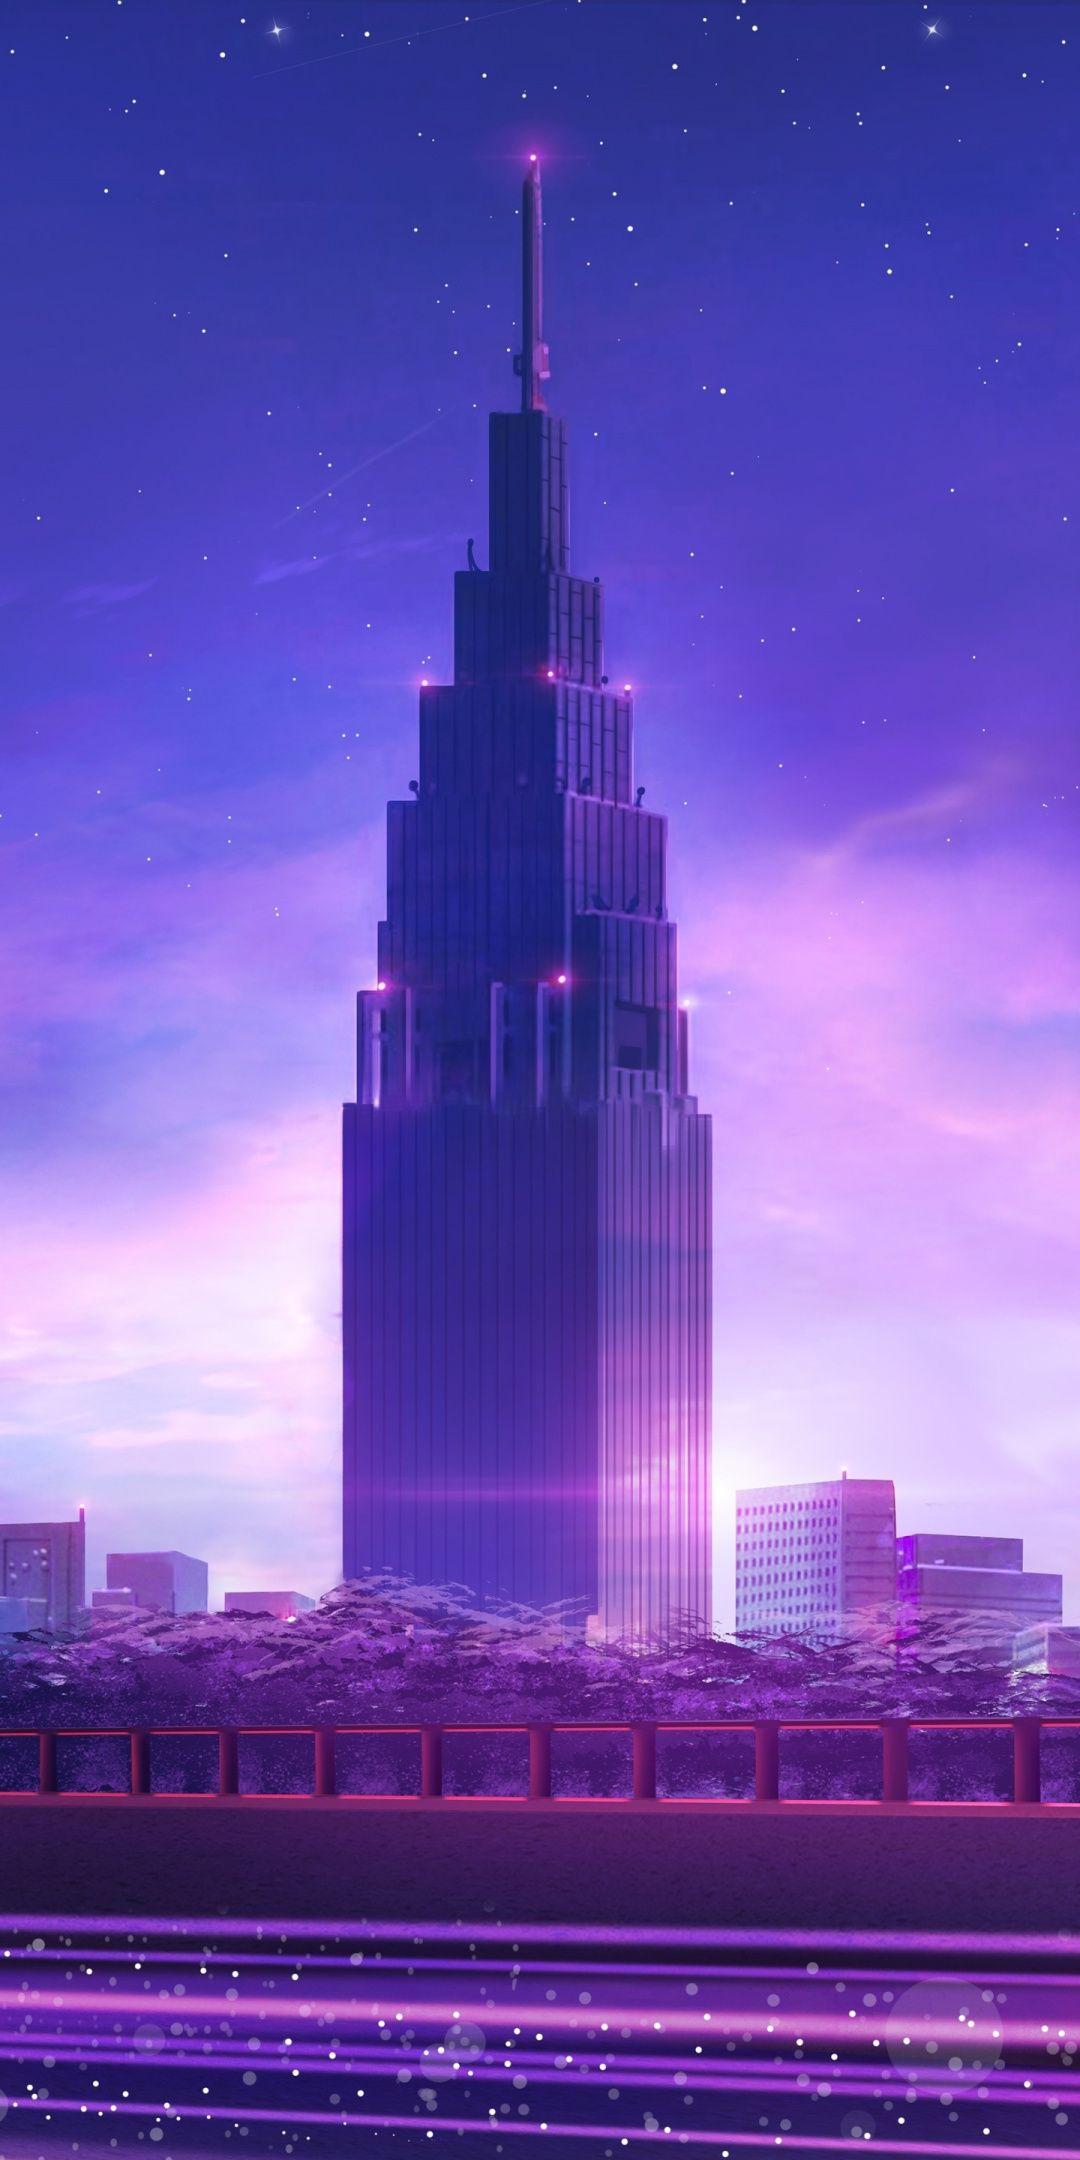 Cityscape, modern tower, city, neon, 1080x2160 wallpaper